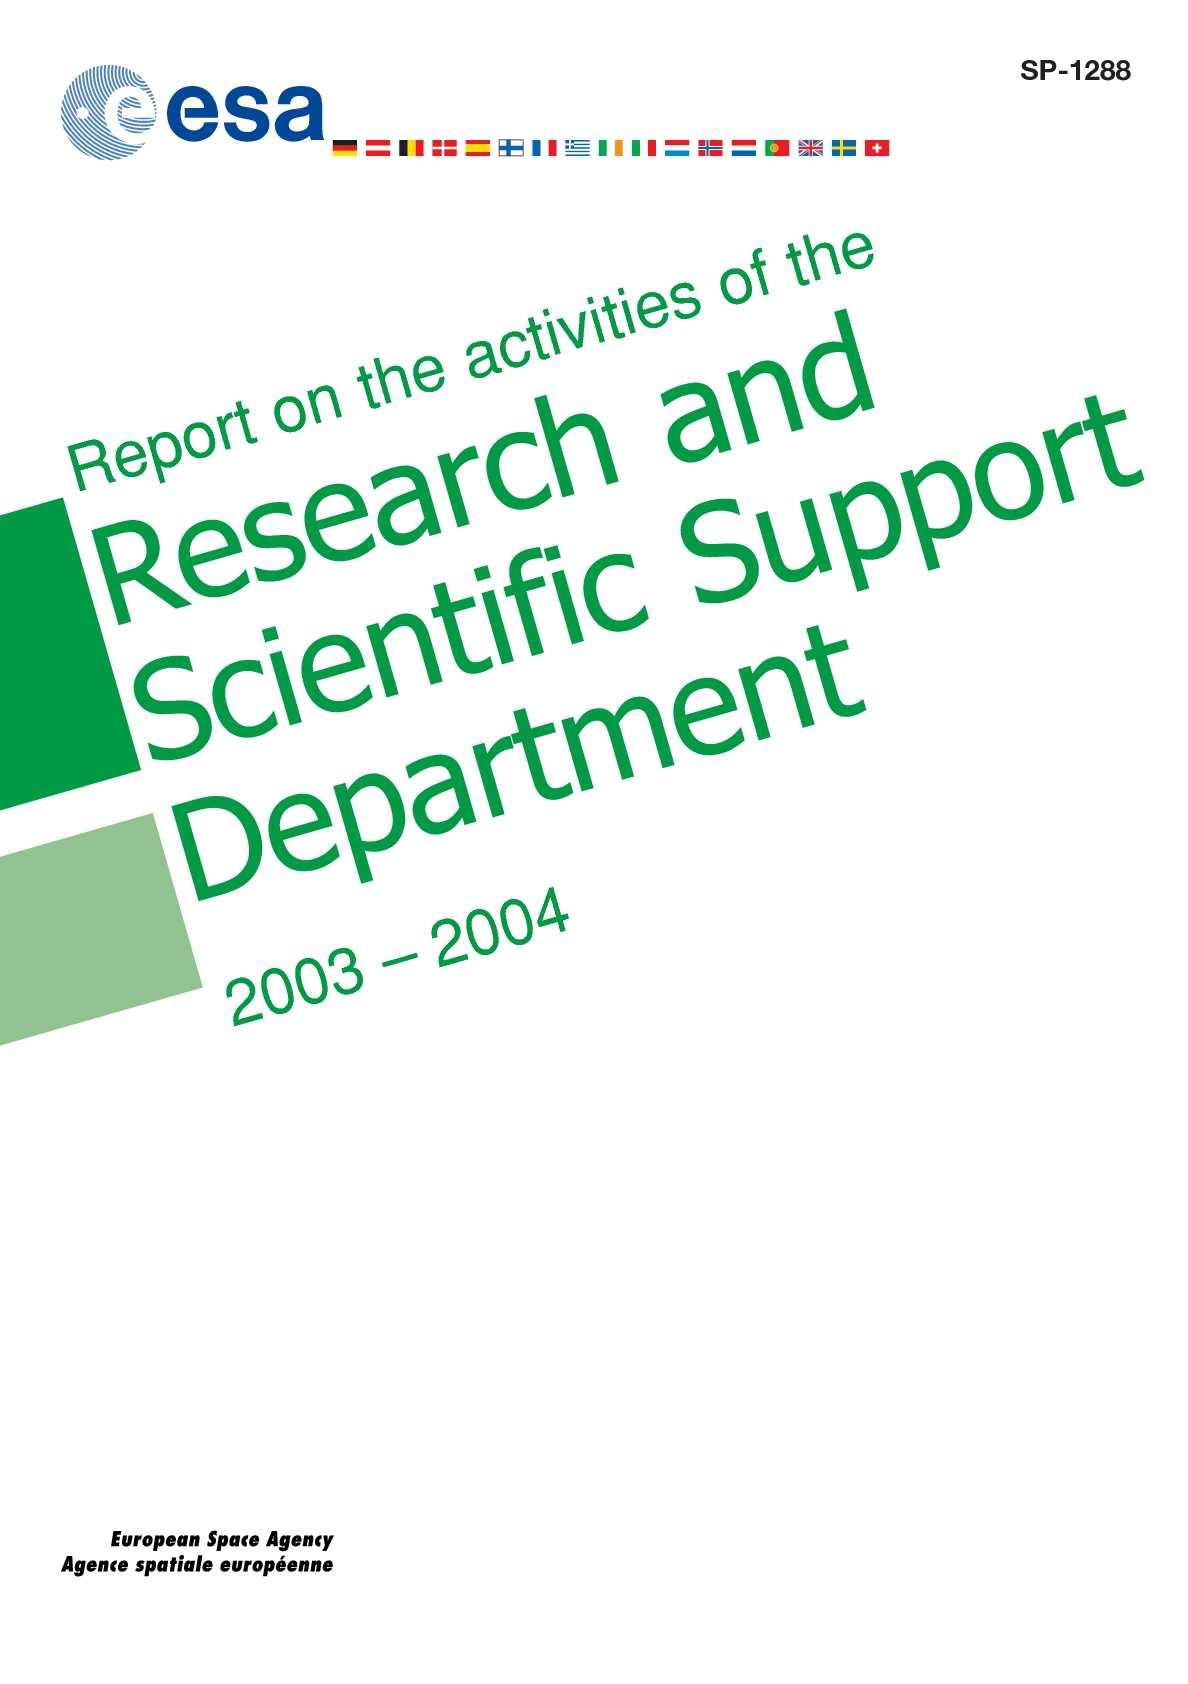 Calamo Rssd Activities 2003 2004 Sp 1288 Ssac Alternating Relay Wiring Diagram